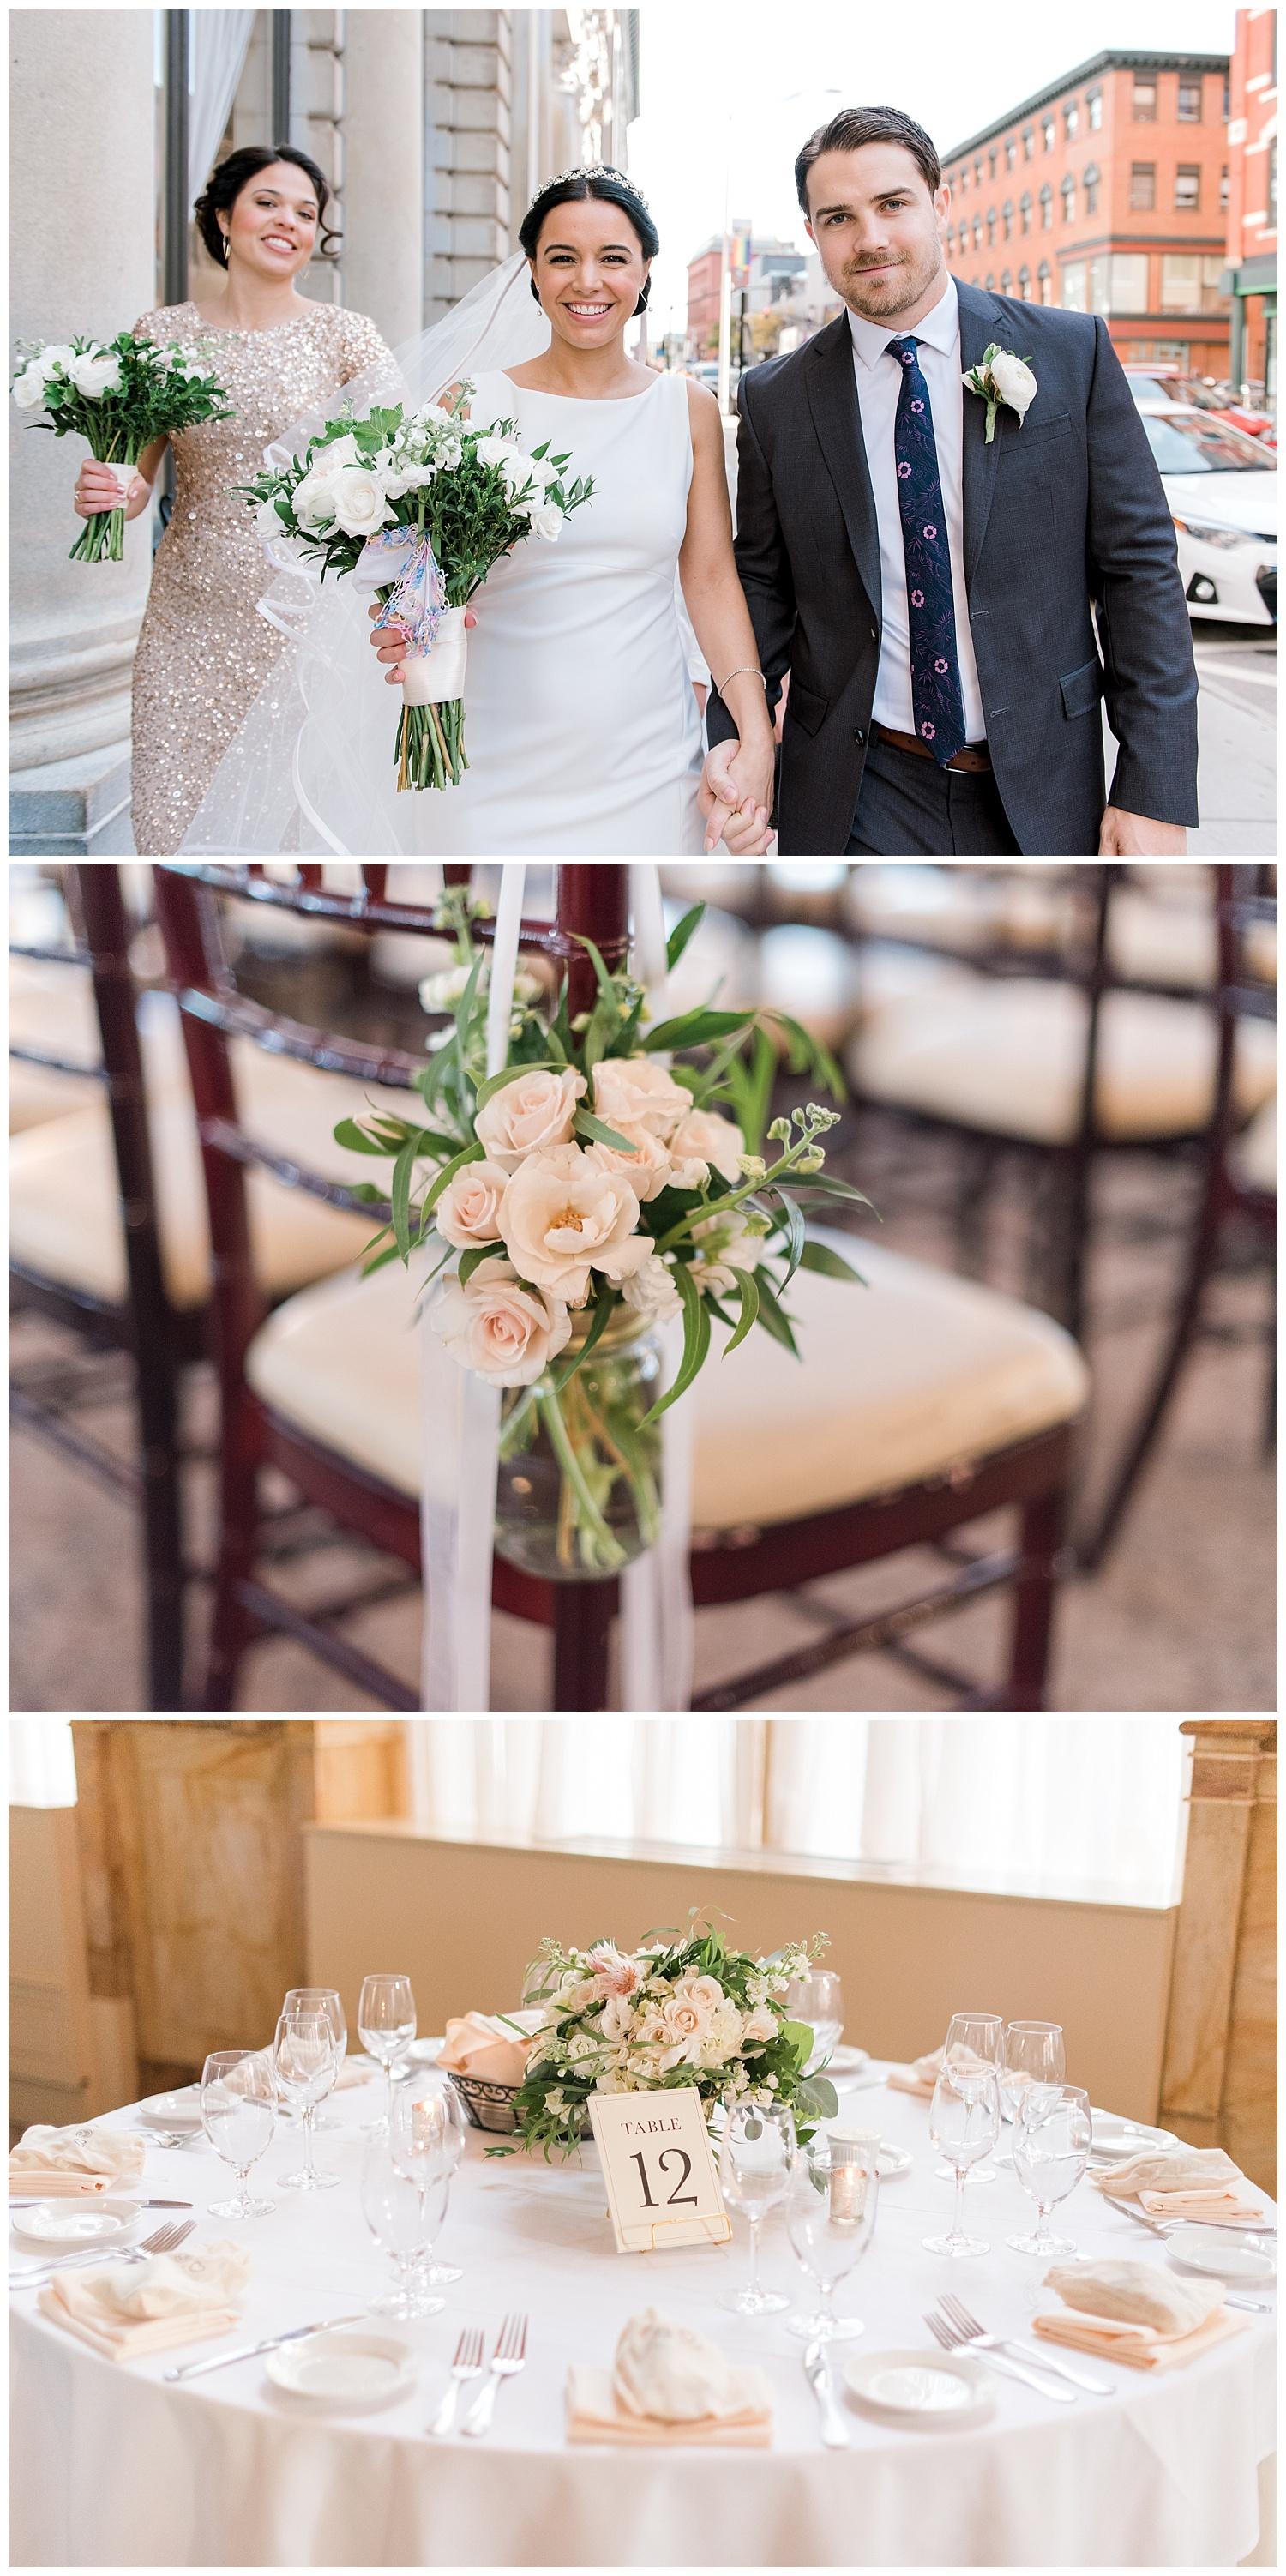 the-dorrance-providence-wedding-photography-october19-photo-1.jpg